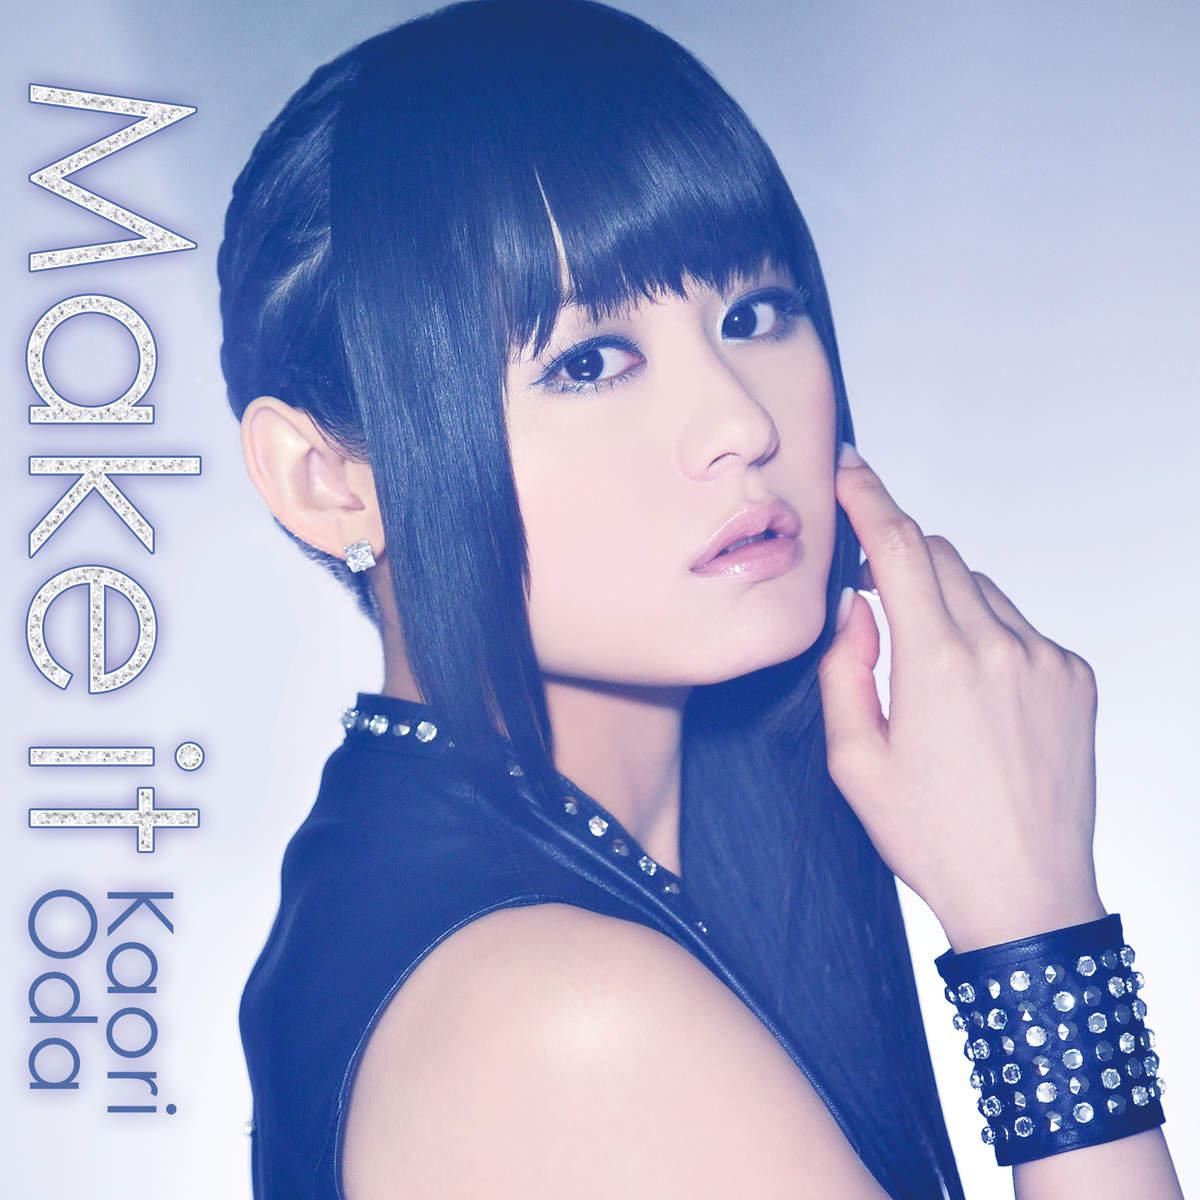 20160529.02.02 Kaori Oda - Make It cover.jpg